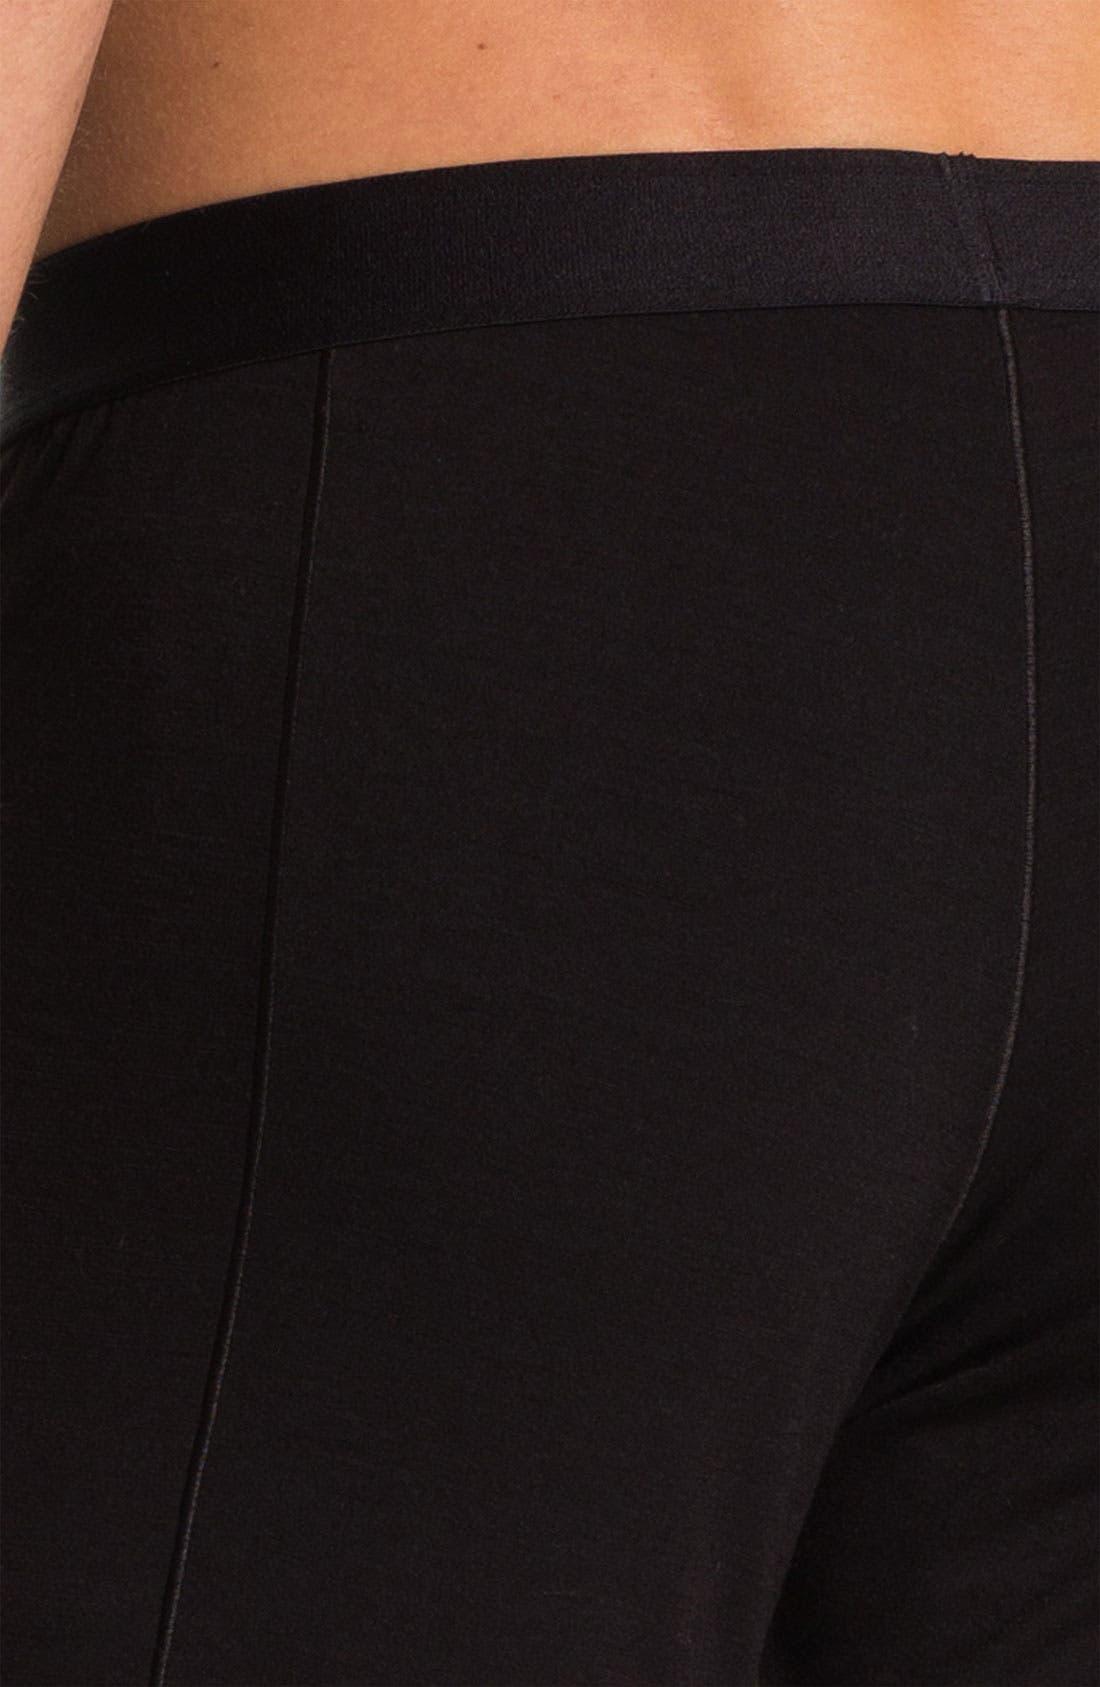 'Merino<sup>®</sup> 2' Base Layer Pants,                             Alternate thumbnail 5, color,